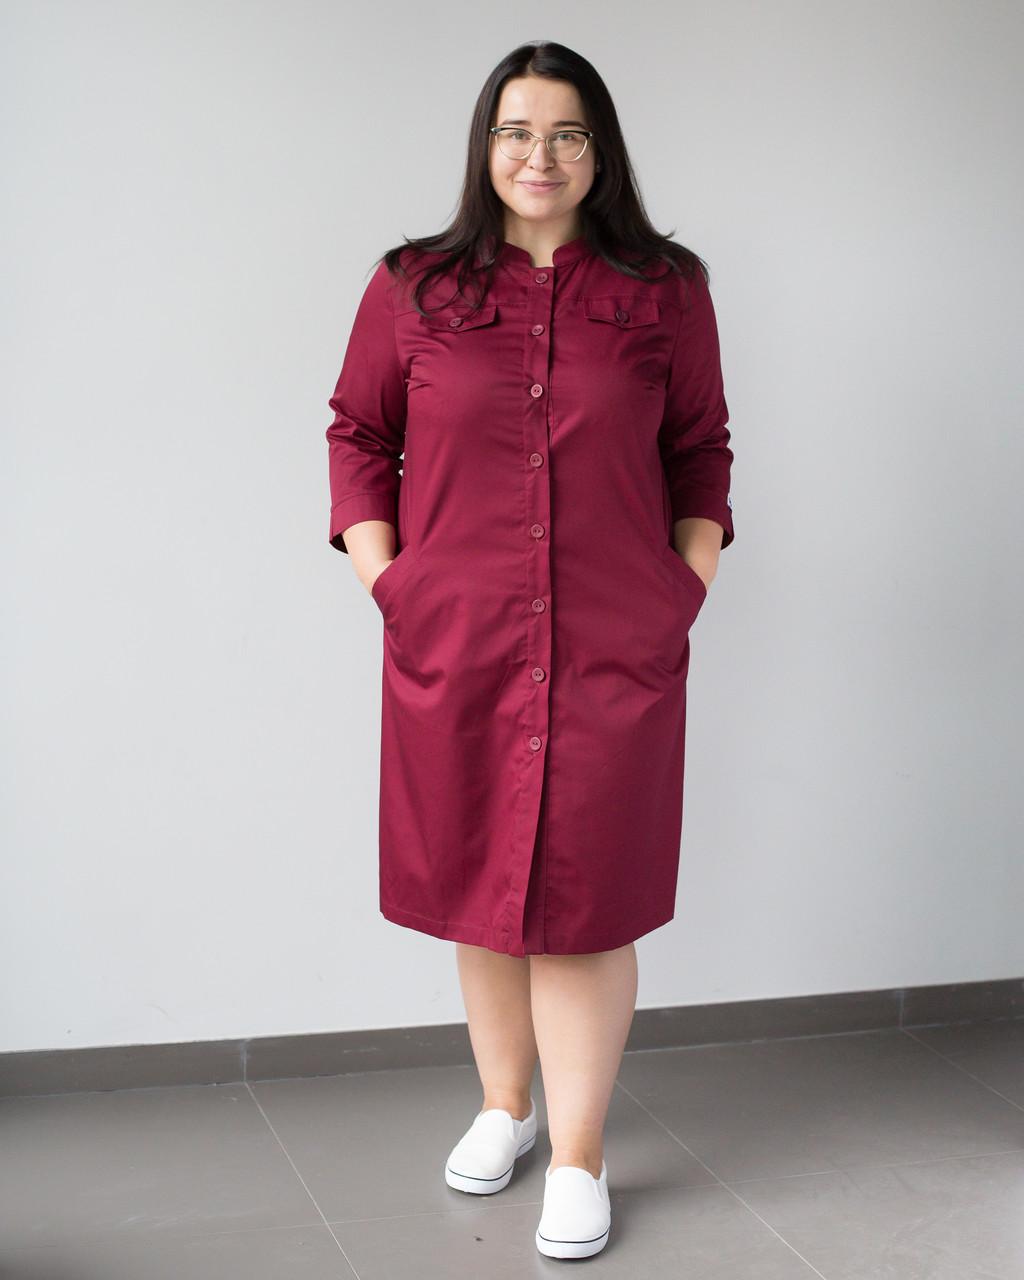 Медицинский женский халат Валери марсала +SIZE